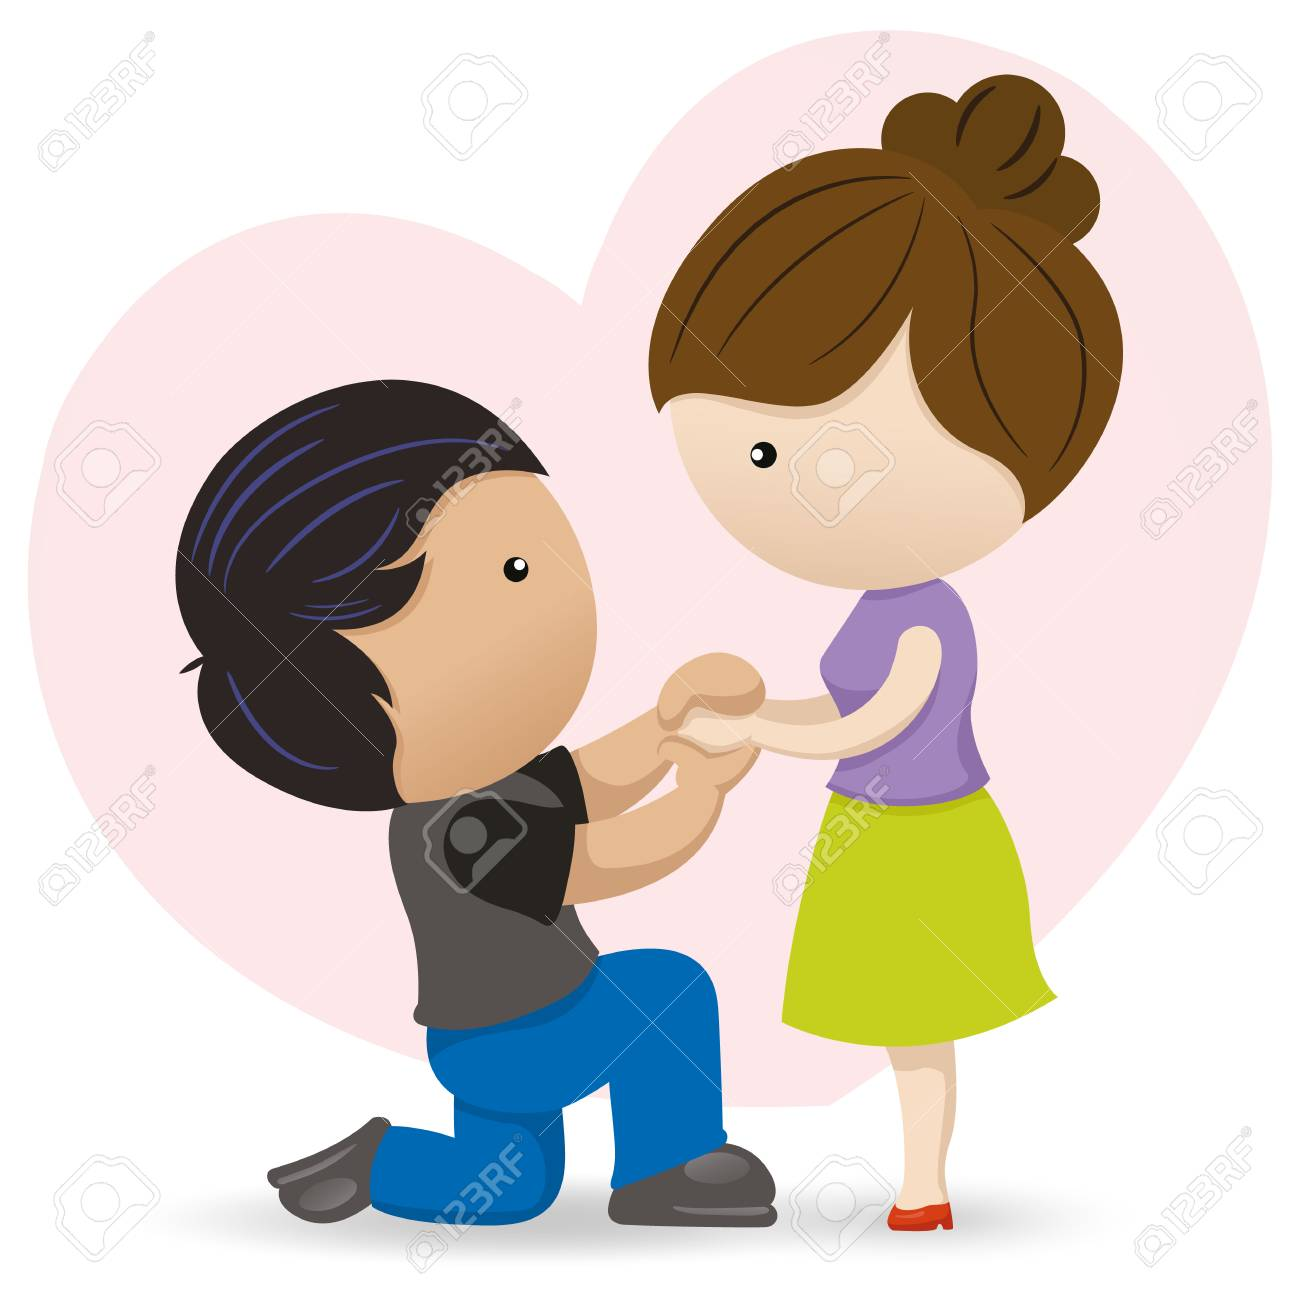 Boyfriend and girlfriend clipart 7 » Clipart Station.